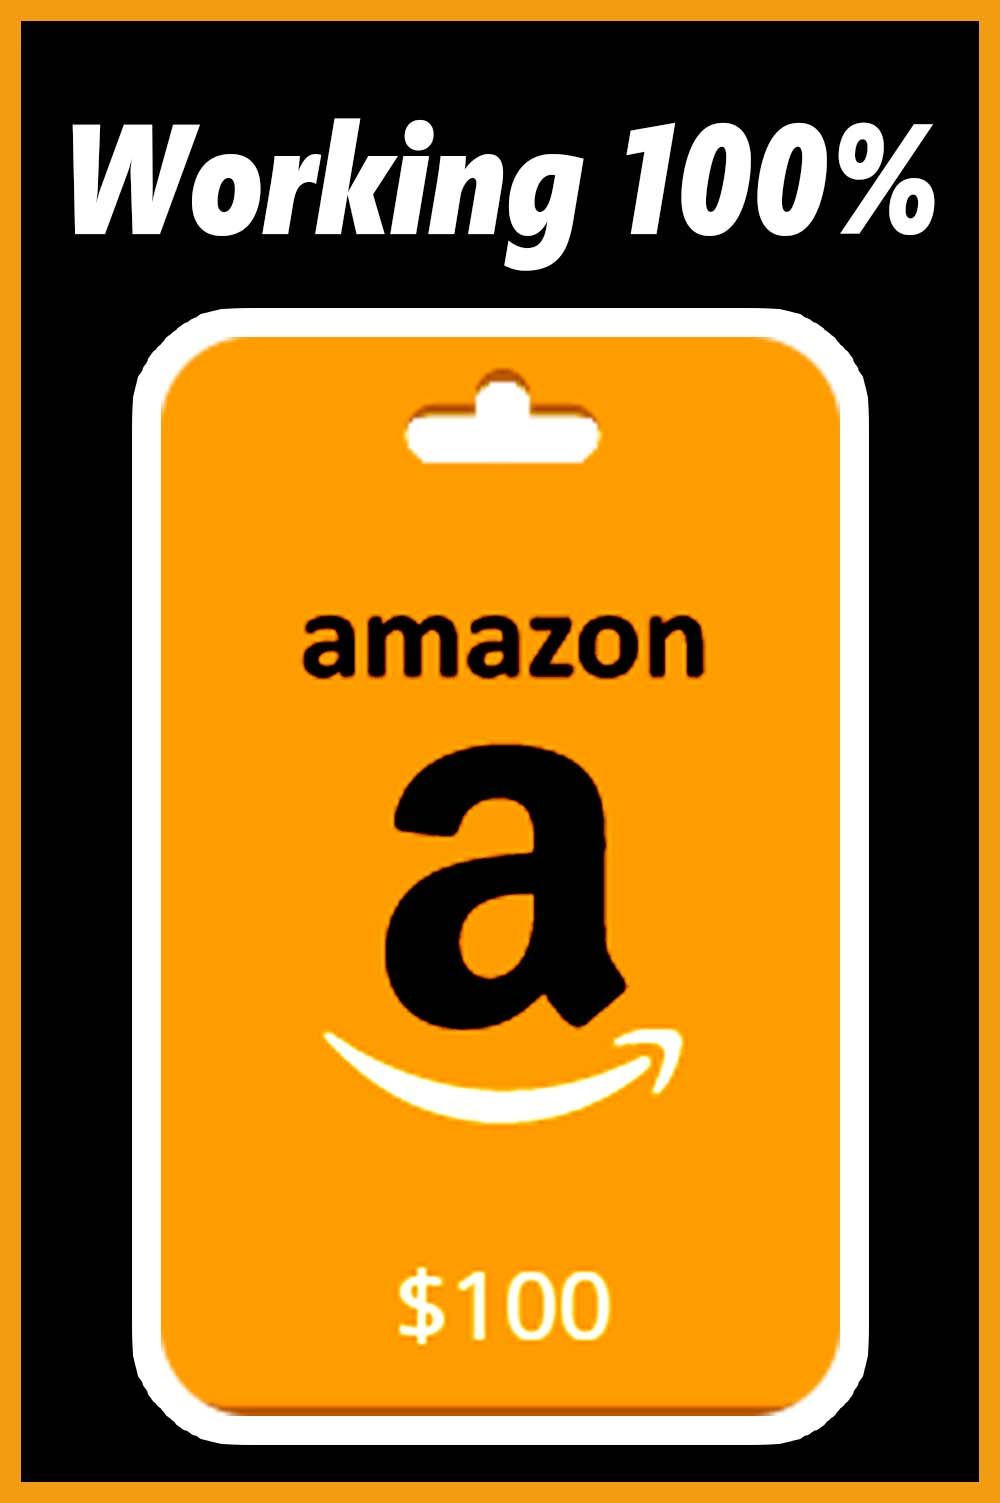 Free Amazon Gift Card Amazon Gift Card Free Free Amazon Products Amazon Gift Cards